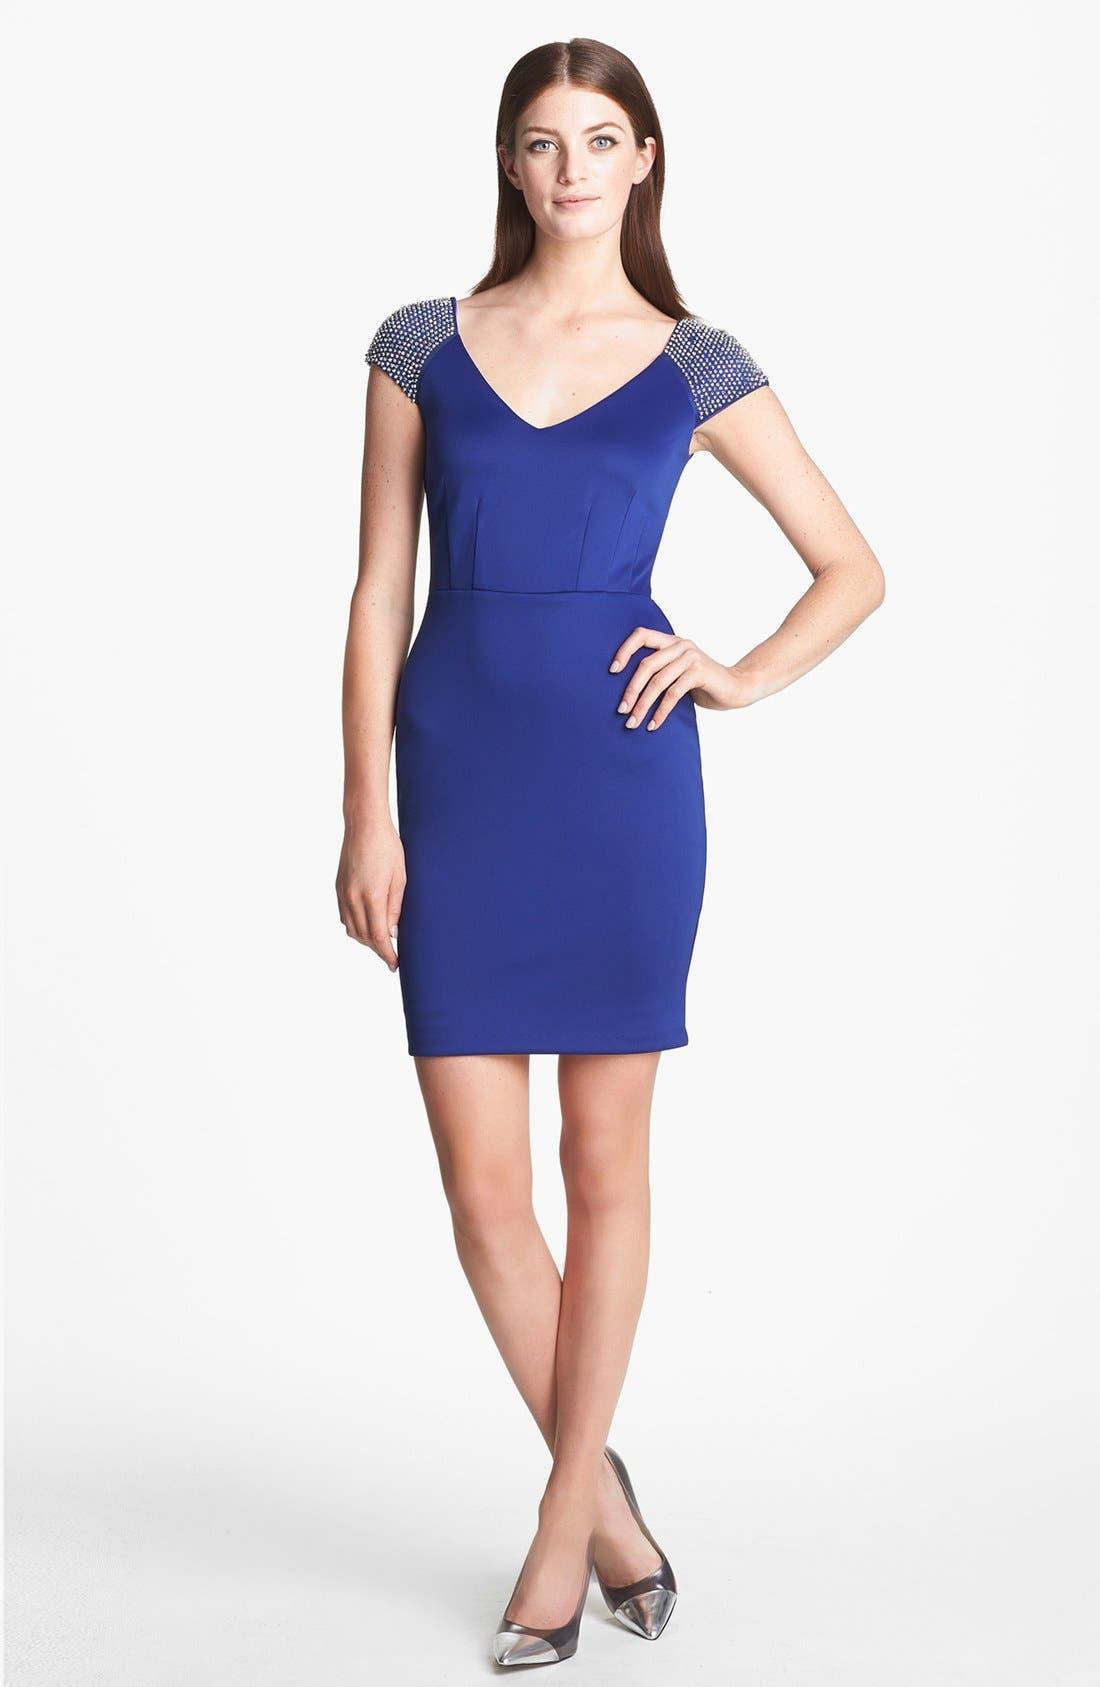 Alternate Image 1 Selected - Alexia Admor Studded Pont Knit Sheath Dress